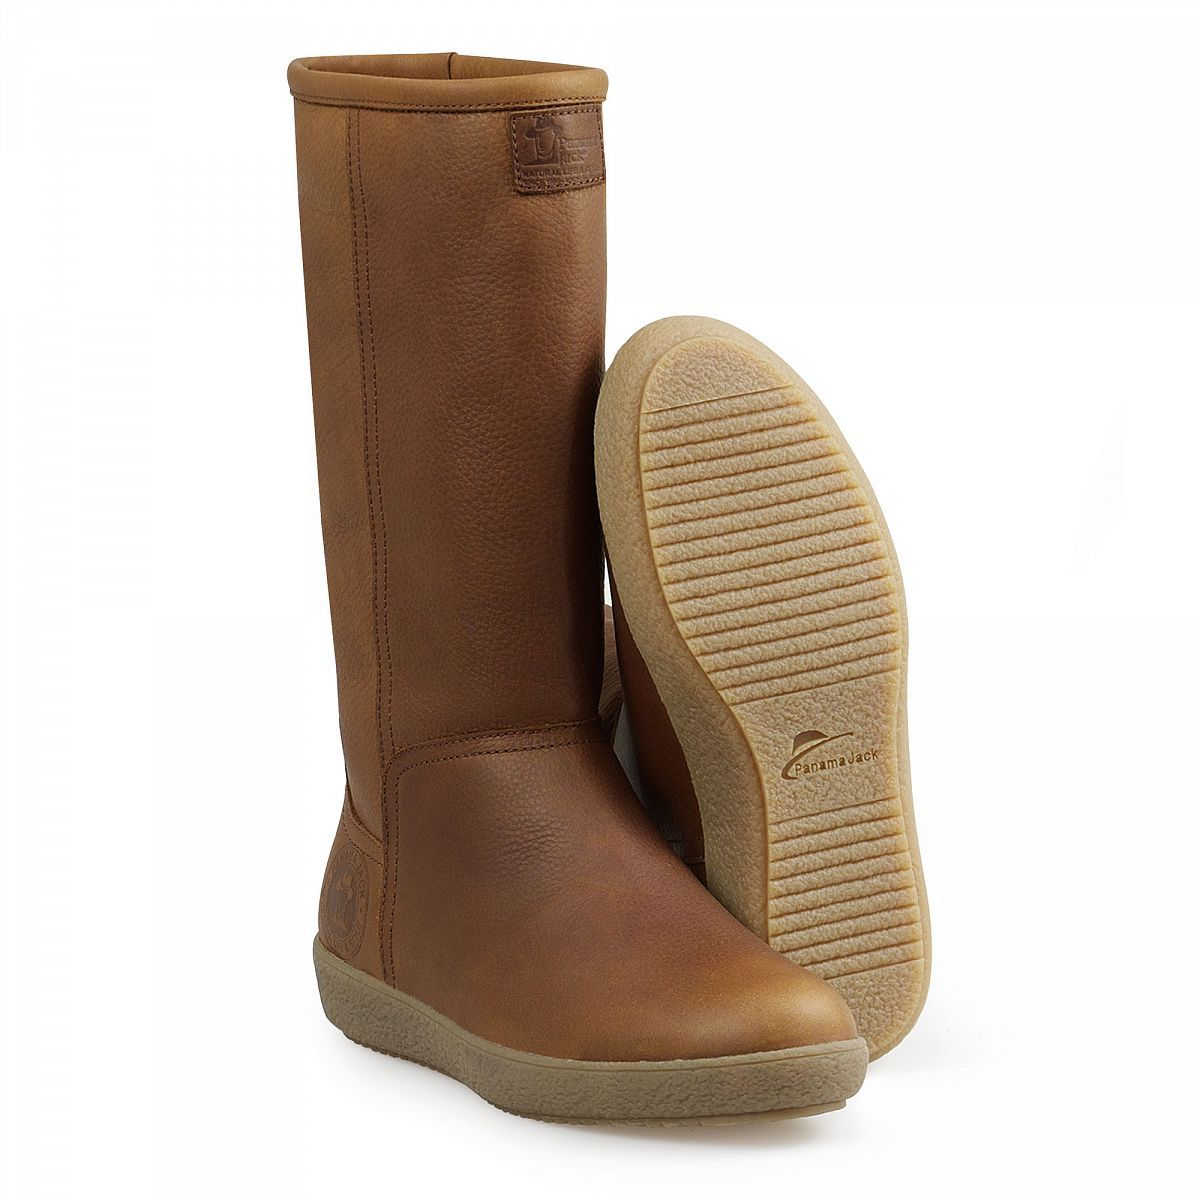 Panama Jack Mirabella Boots Chelsea Boots Fashion Boots